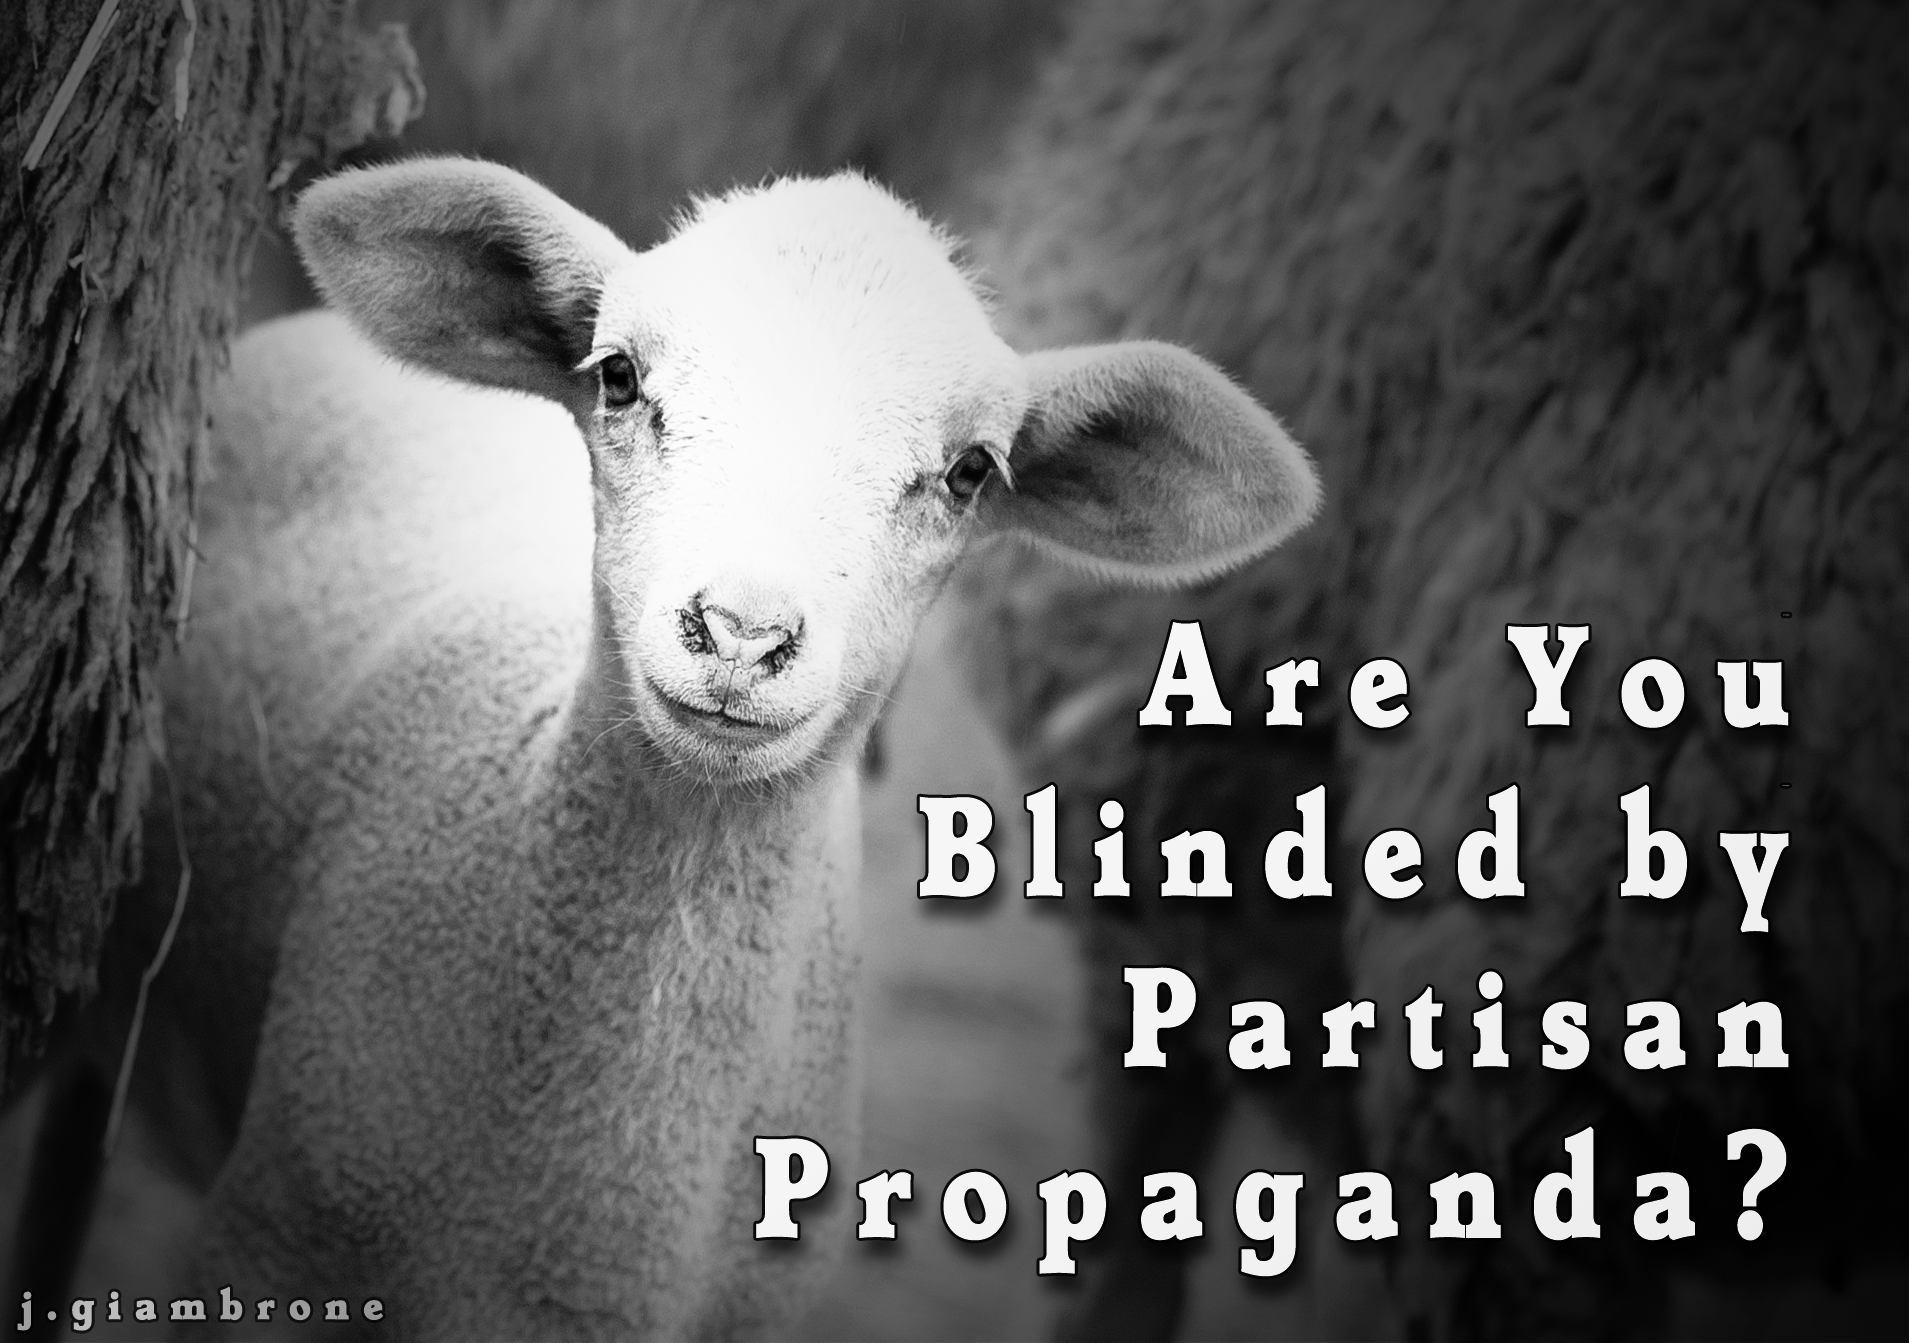 blinded-partisan-propaganda copy